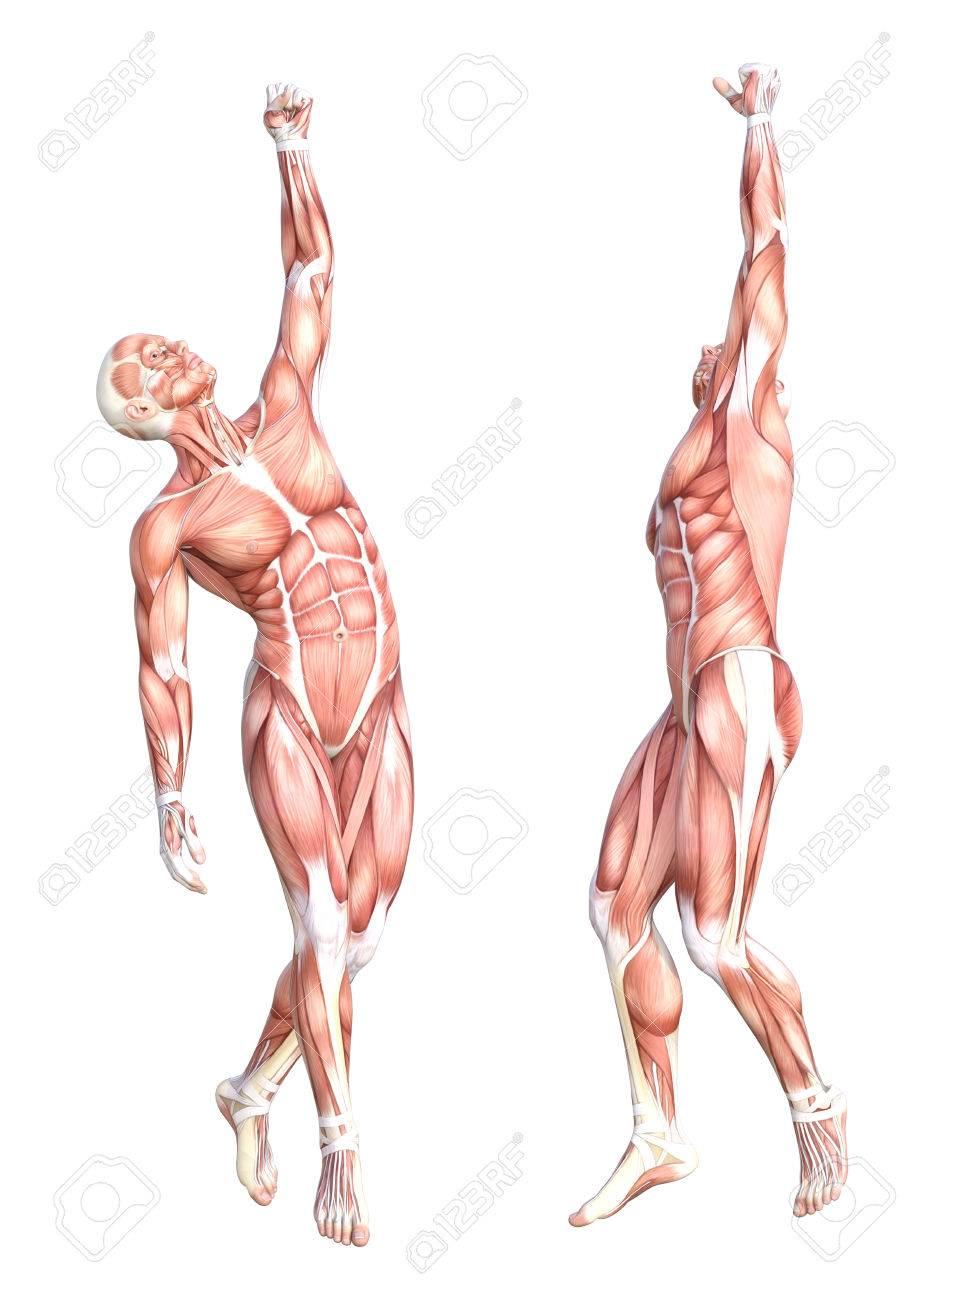 Berühmt Muskelsystem Bilder Beschriftet Galerie - Menschliche ...